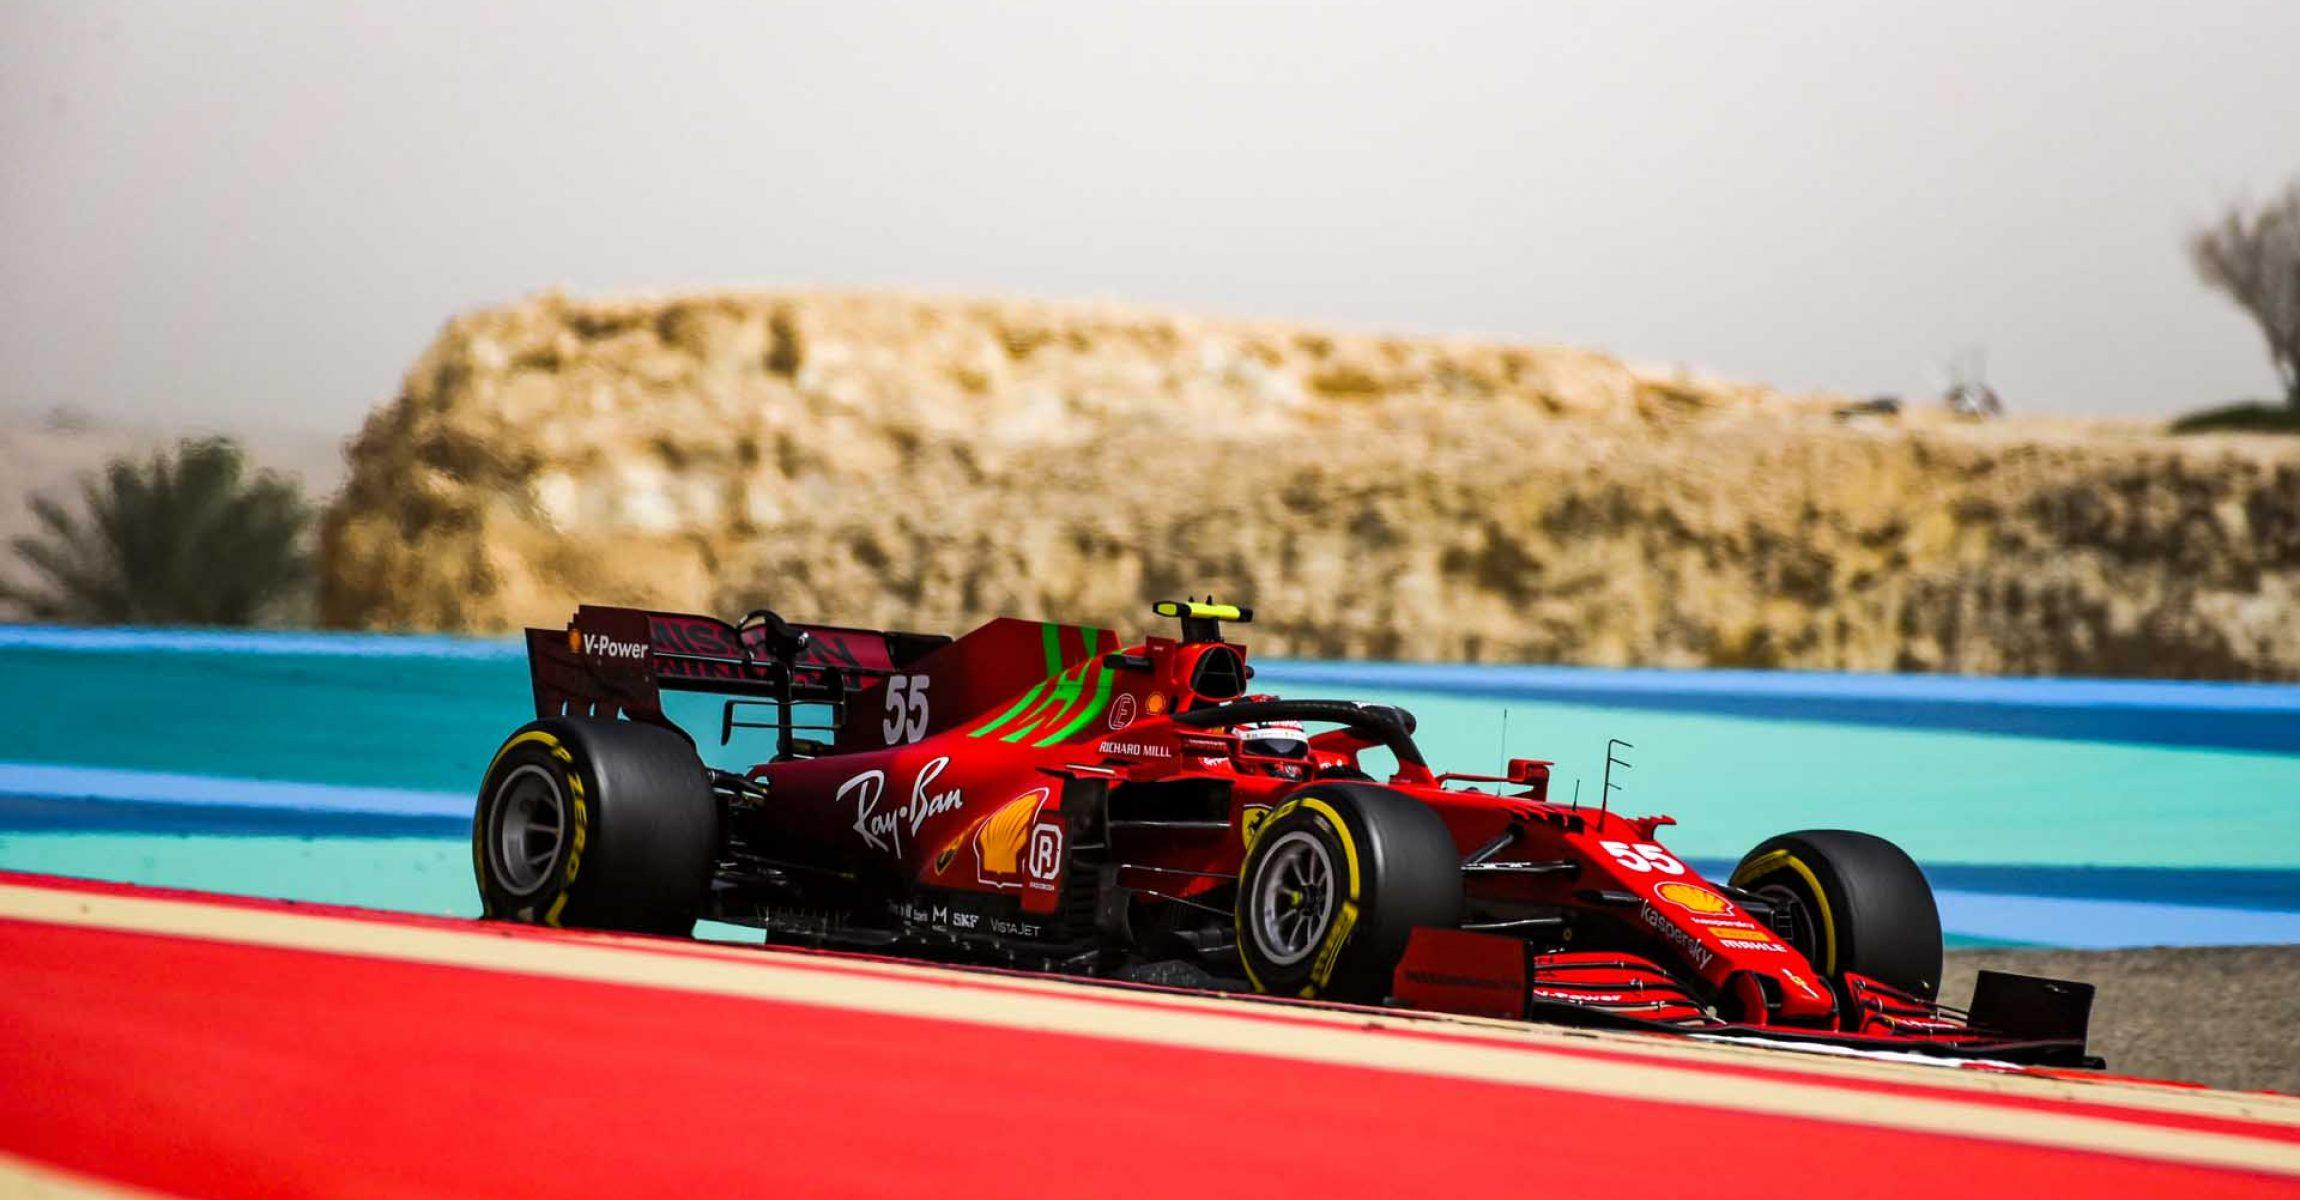 FERRARI F1 TEST BAHRAIN - SABATO 13/03/2021 credit: @Scuderia Ferrari Press Office Carlos Sainz